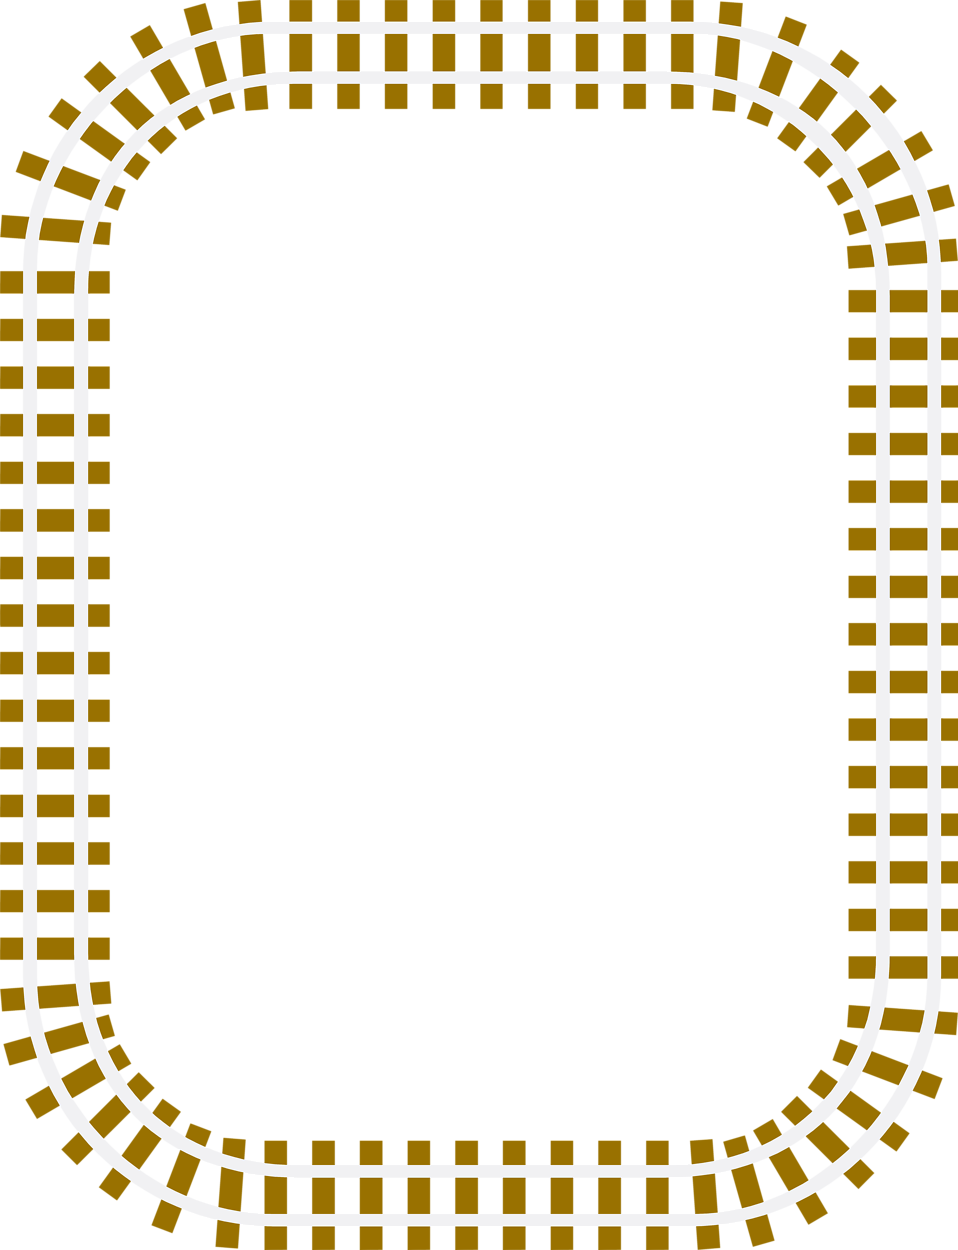 Illustration of a blank railroad track frame border : Free Stock.